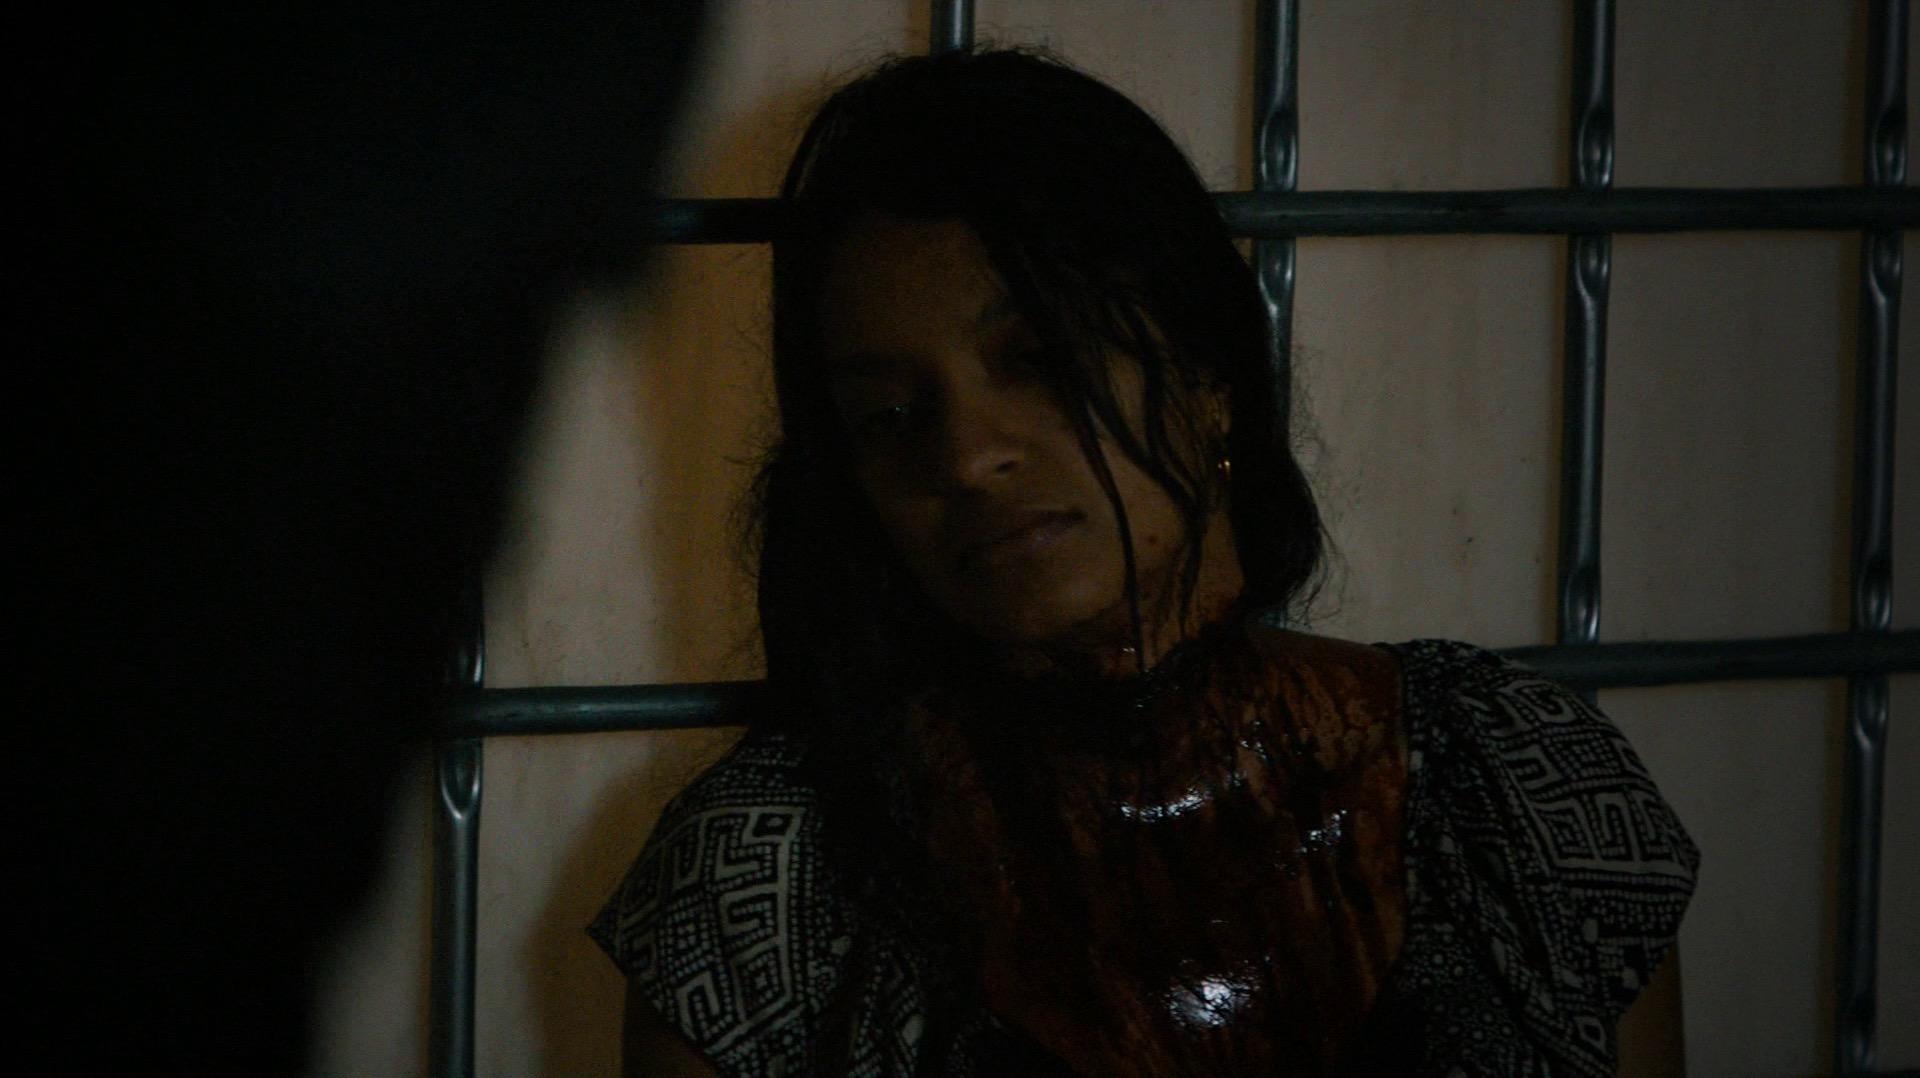 Irina, with her throat slit